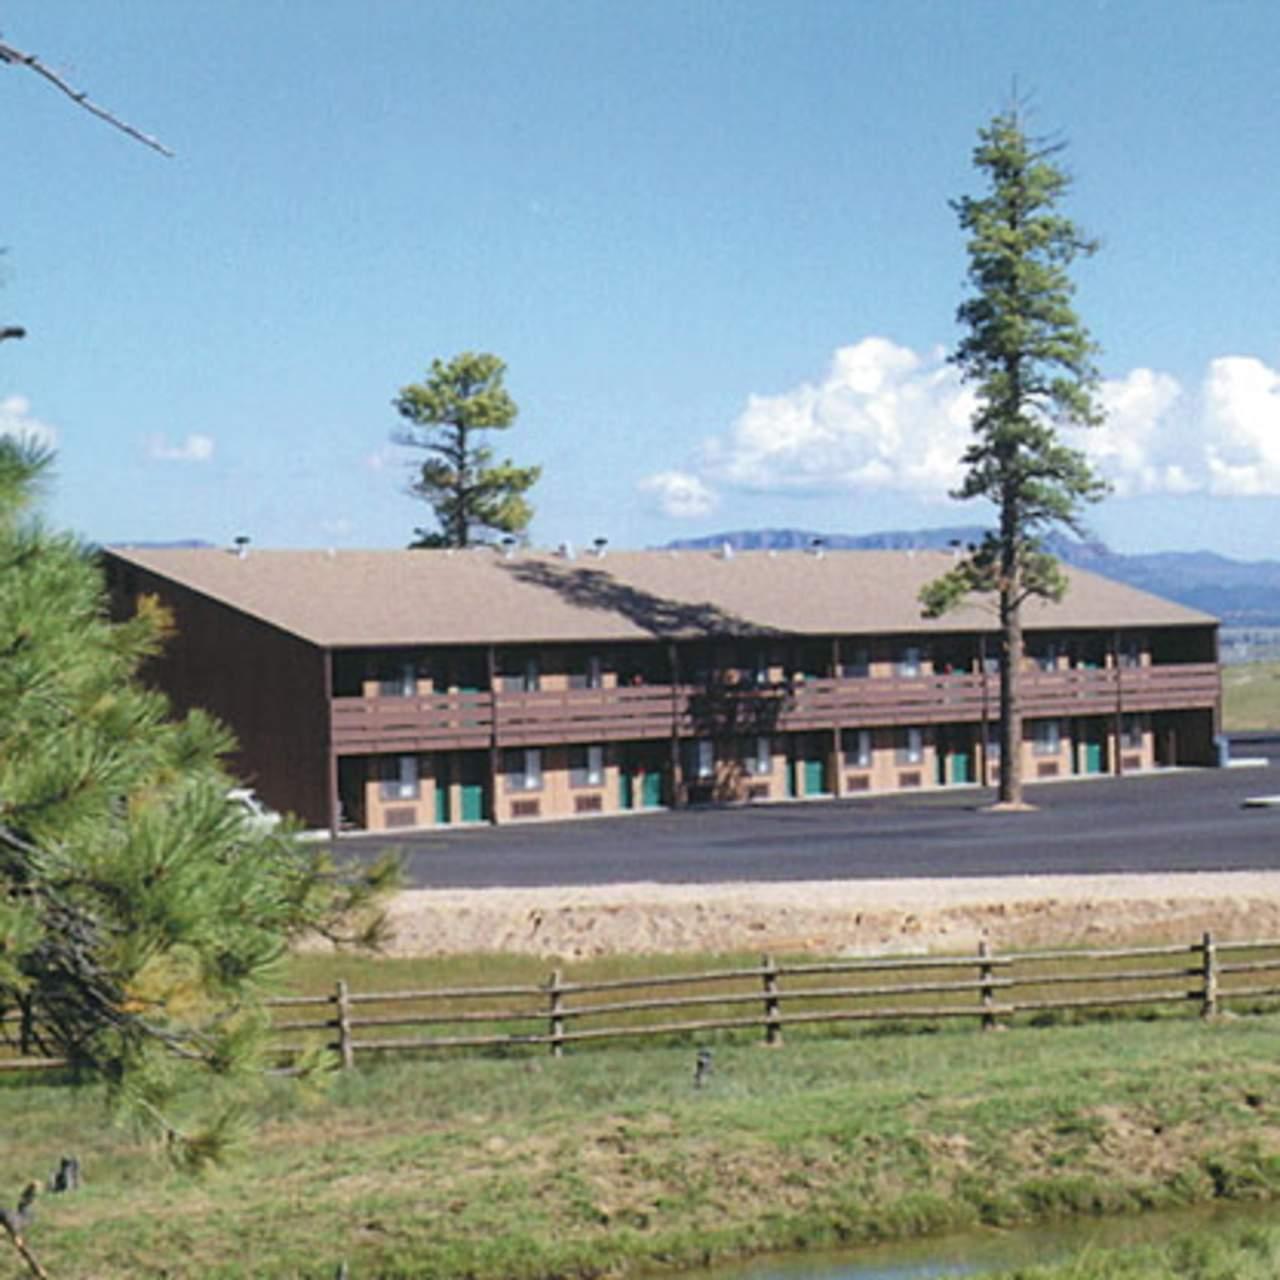 hotel utah bryce view lodge canusa. Black Bedroom Furniture Sets. Home Design Ideas